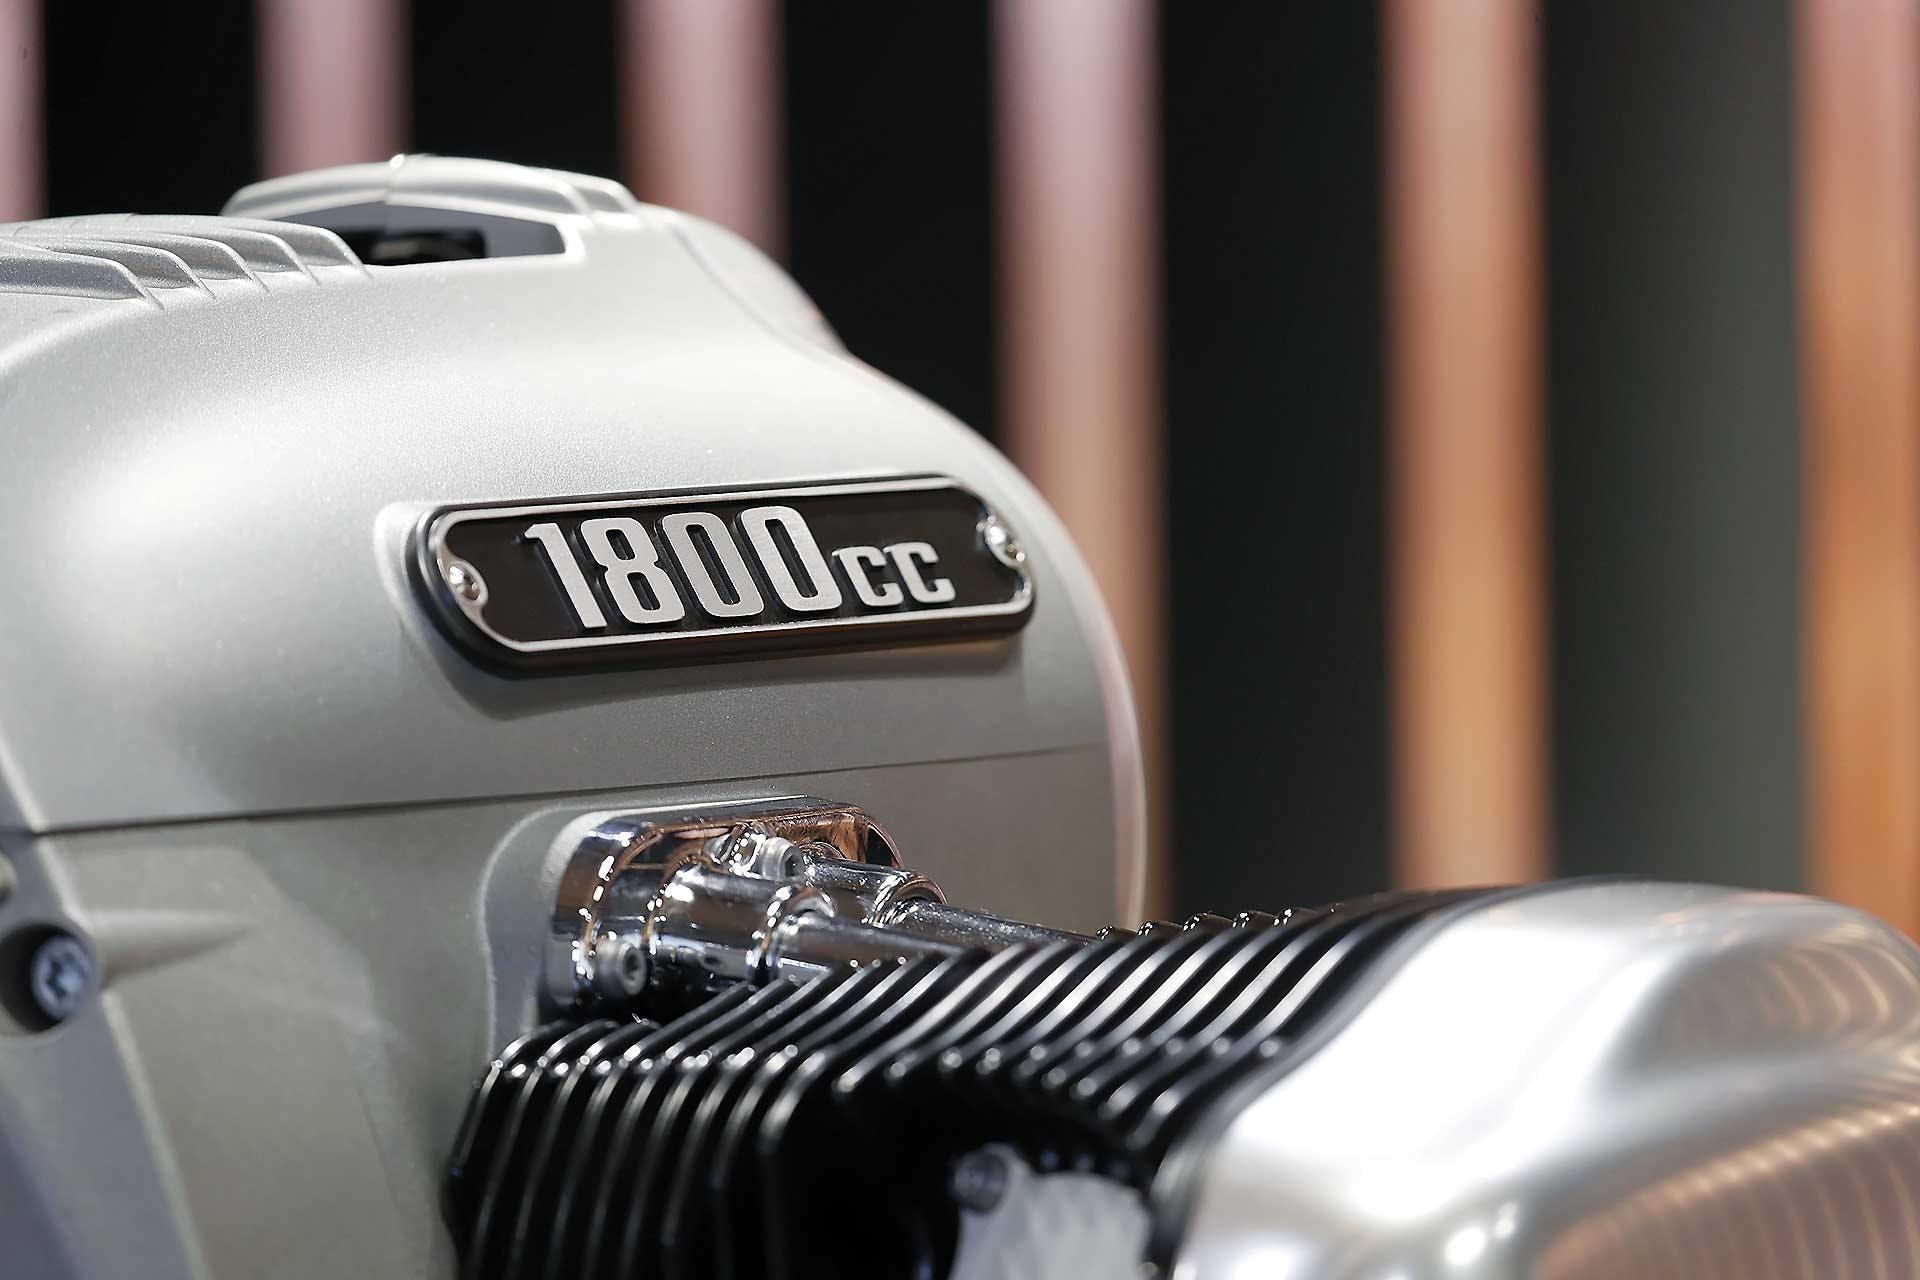 Motore BMW Big Boxer dettaglio